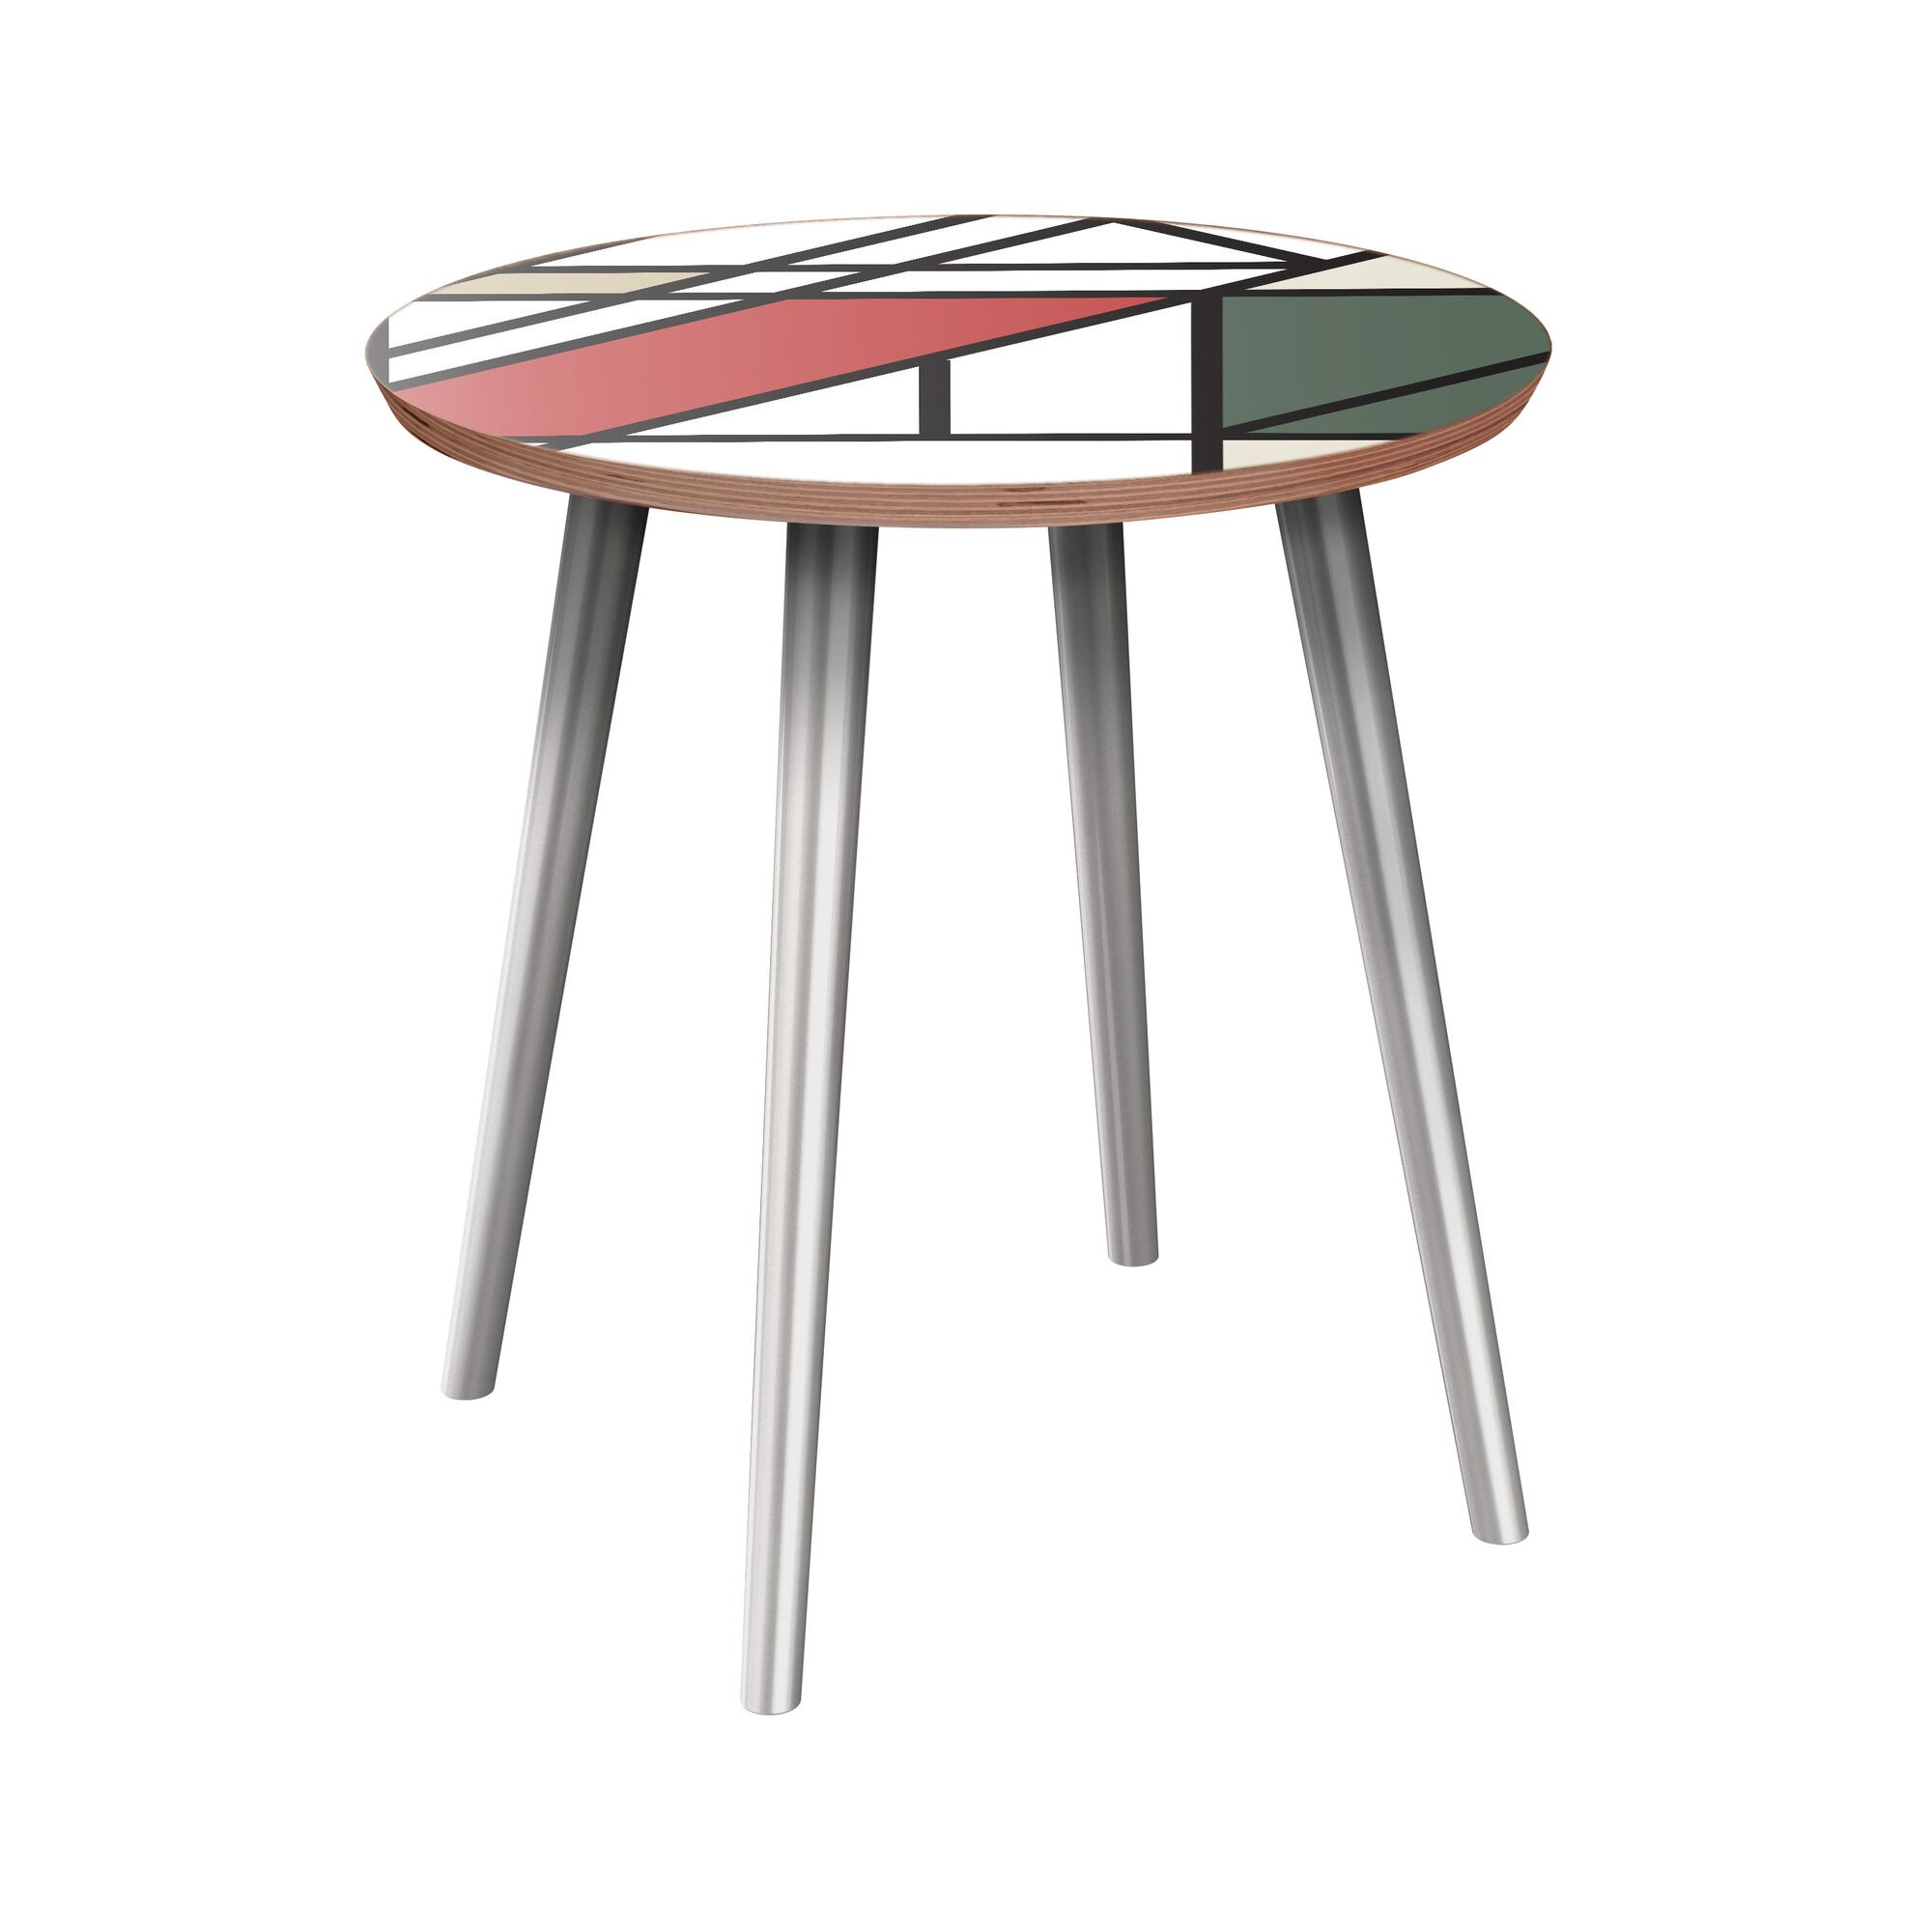 Kassidi End Table Table Base Color: Chrome, Table Top Color: Walnut